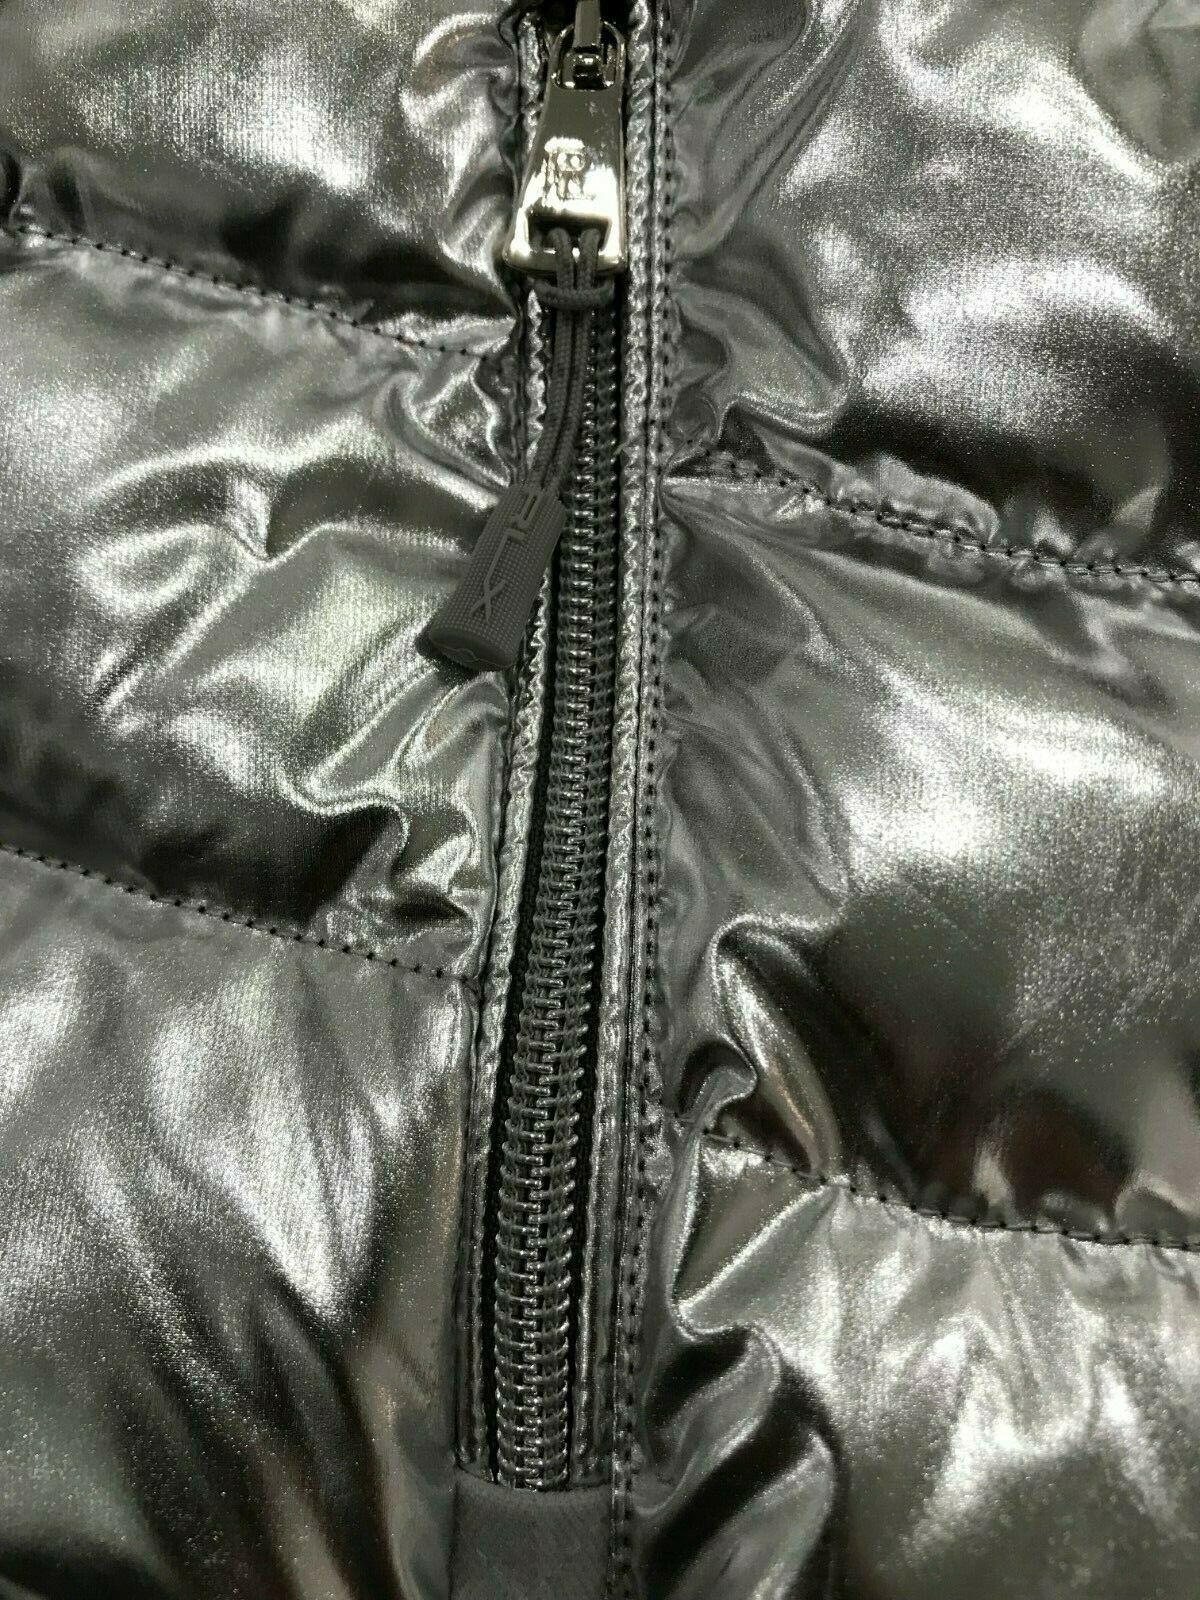 Ralph Lauren Purple Label RLX Foil Metallic Silver Down Puffer Jacket $995 Large